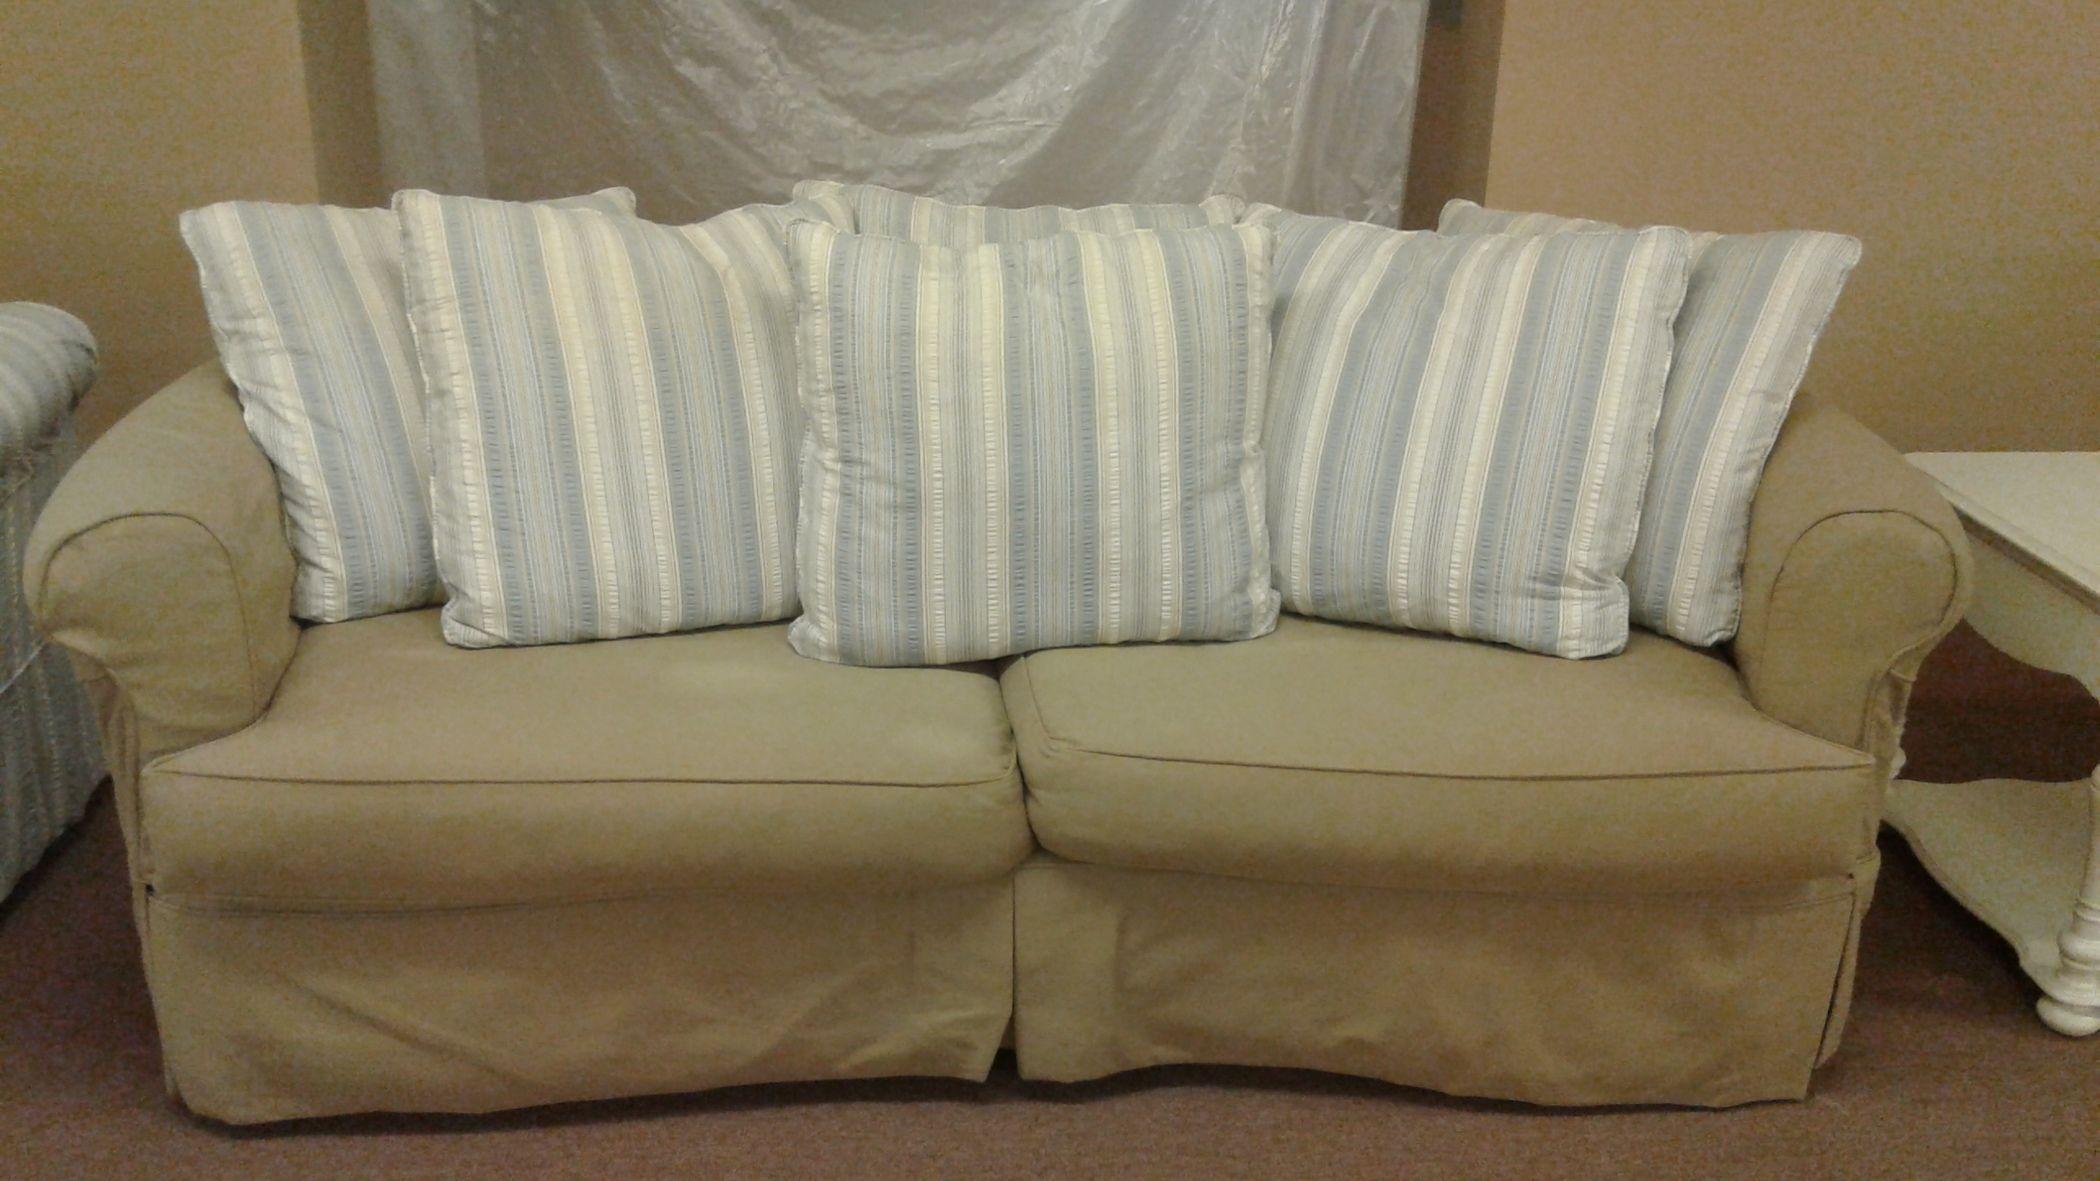 Four Seasons Slip Cover Sofa Delmarva Furniture Consignment